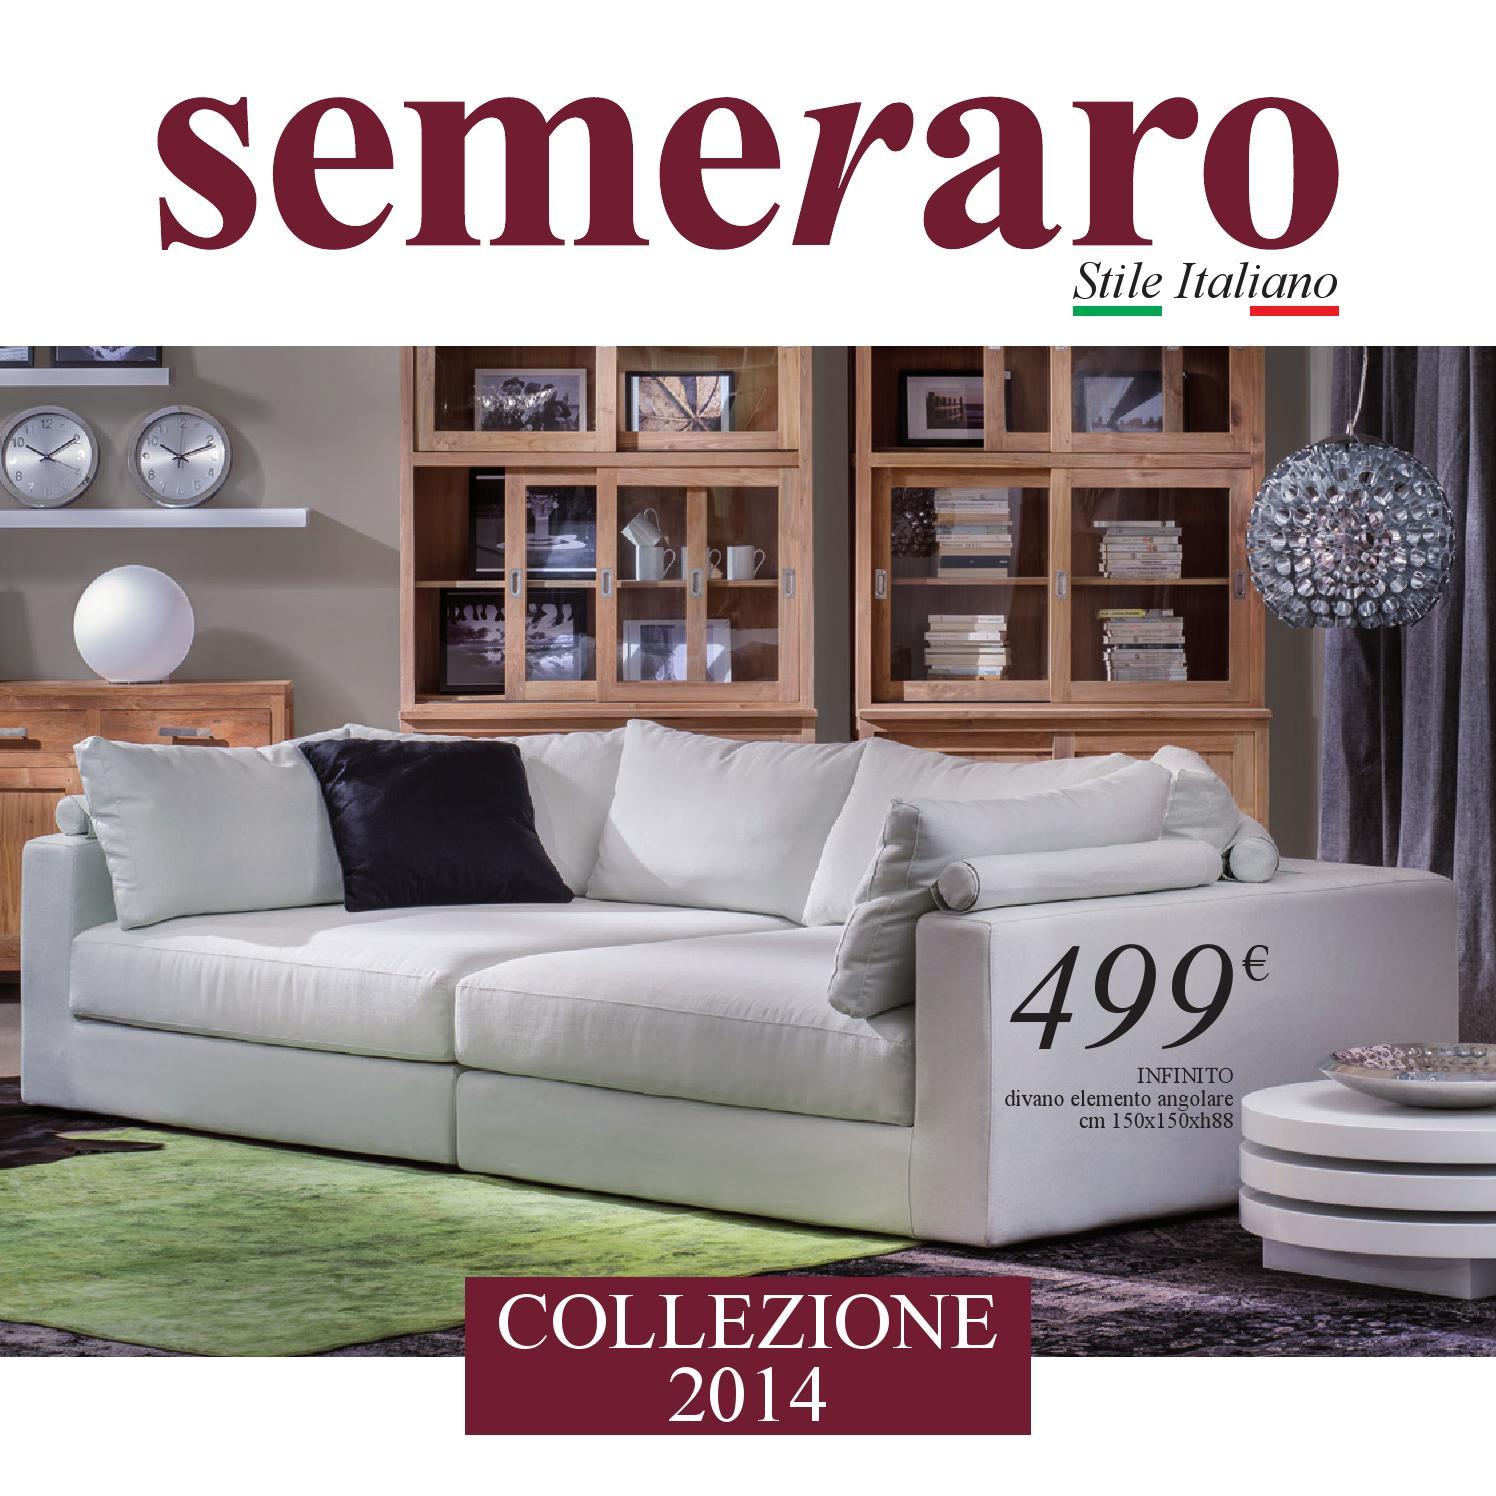 Catalogo 2014 by OVVIO - issuu